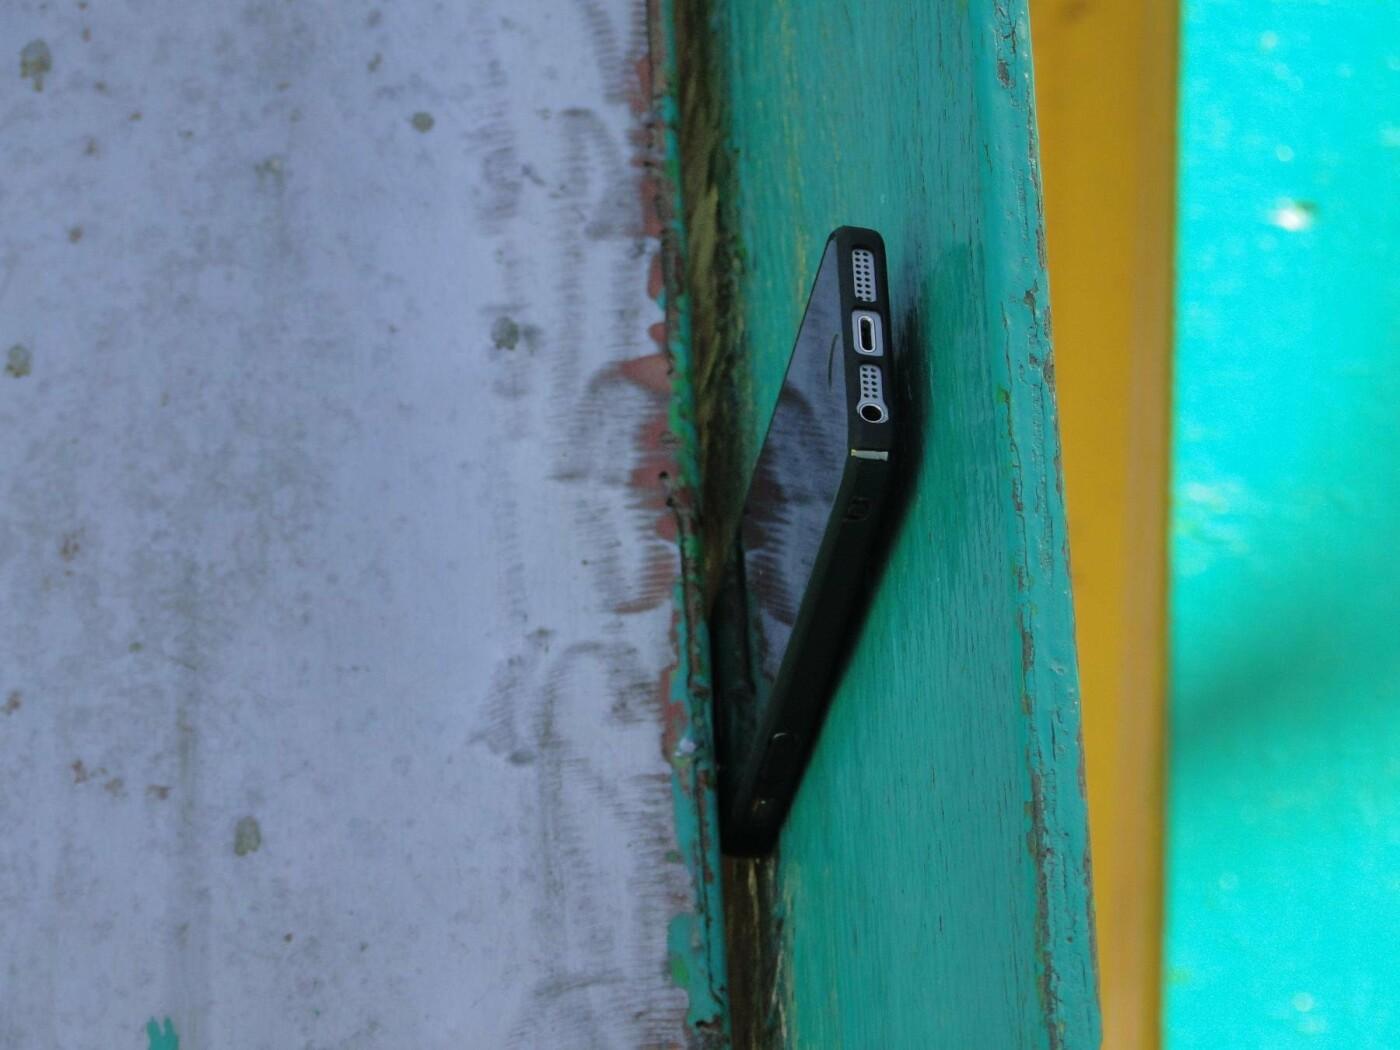 Травмоване дитинство: де зачаїлася небезпека на дитячому майданчику в парку Чекмана. ФОТО, фото-3